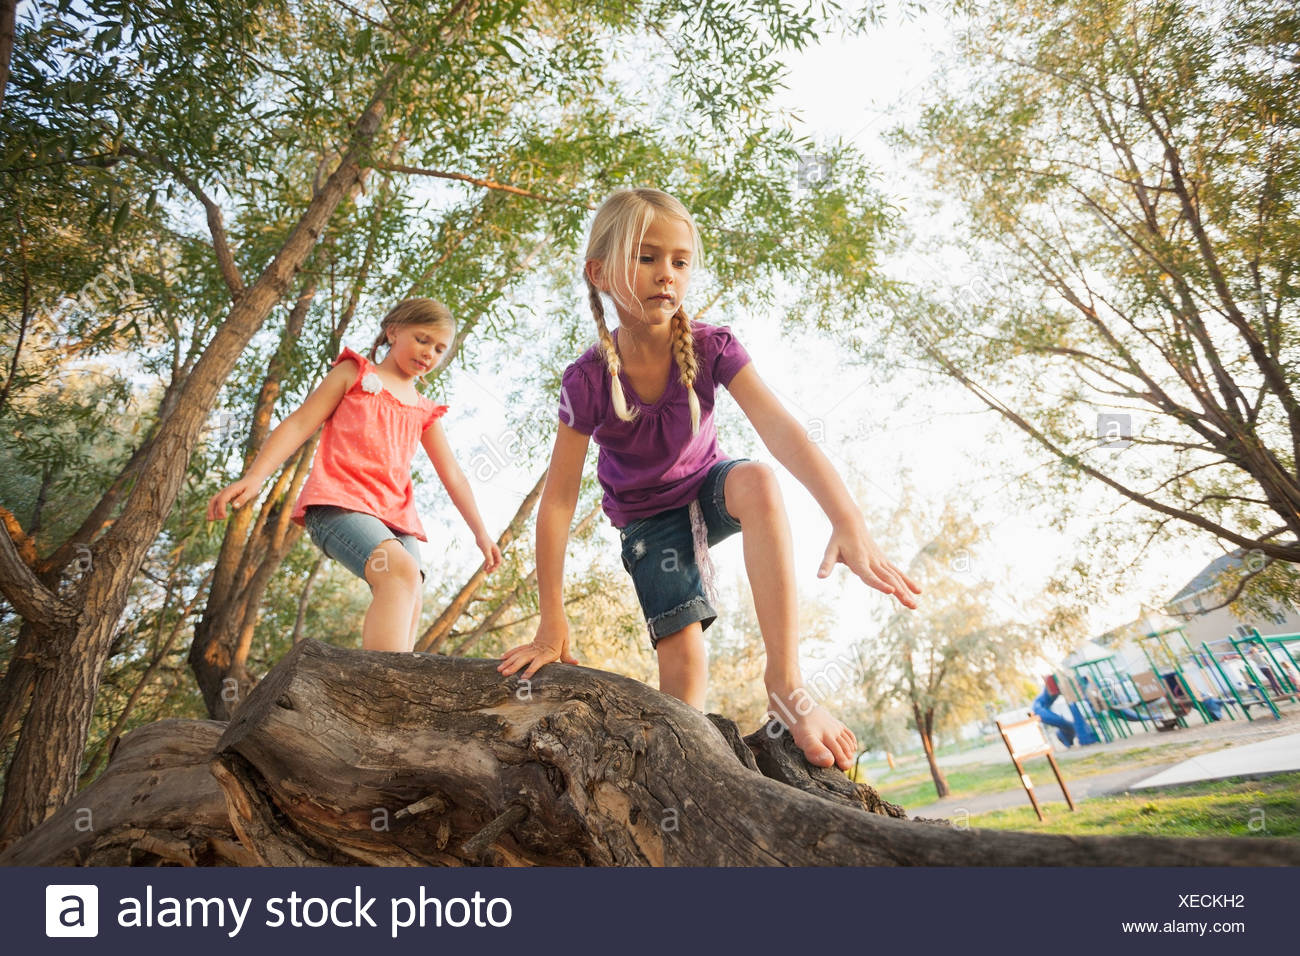 USA, Utah, Lehi, Two little girls (4-5, 6-7) climbing on very large tree branch - Stock Image